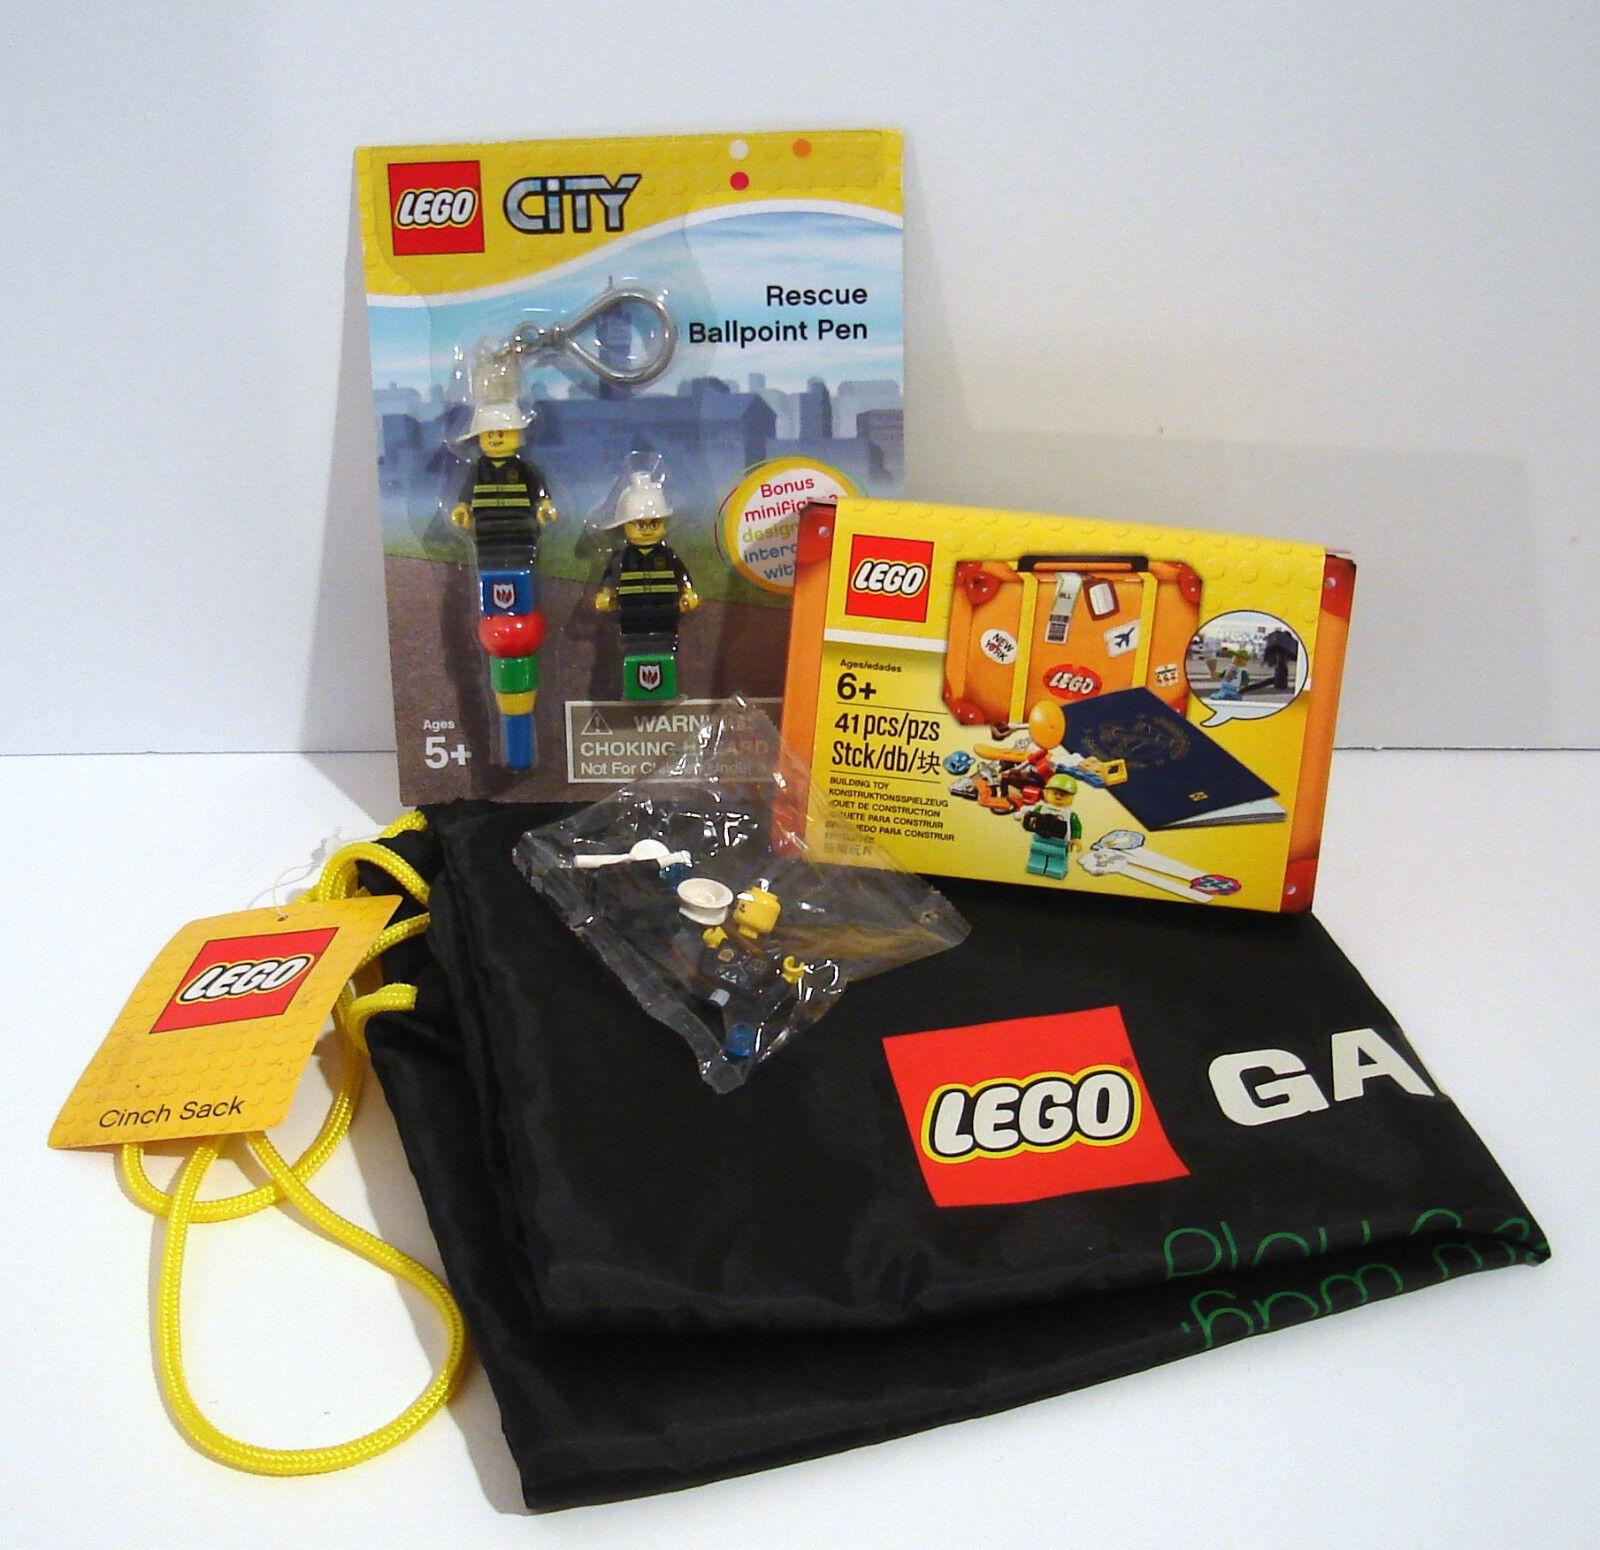 Lego Gift Pack Lot Rescue Pen Passport Set Cinch Sack Minifi